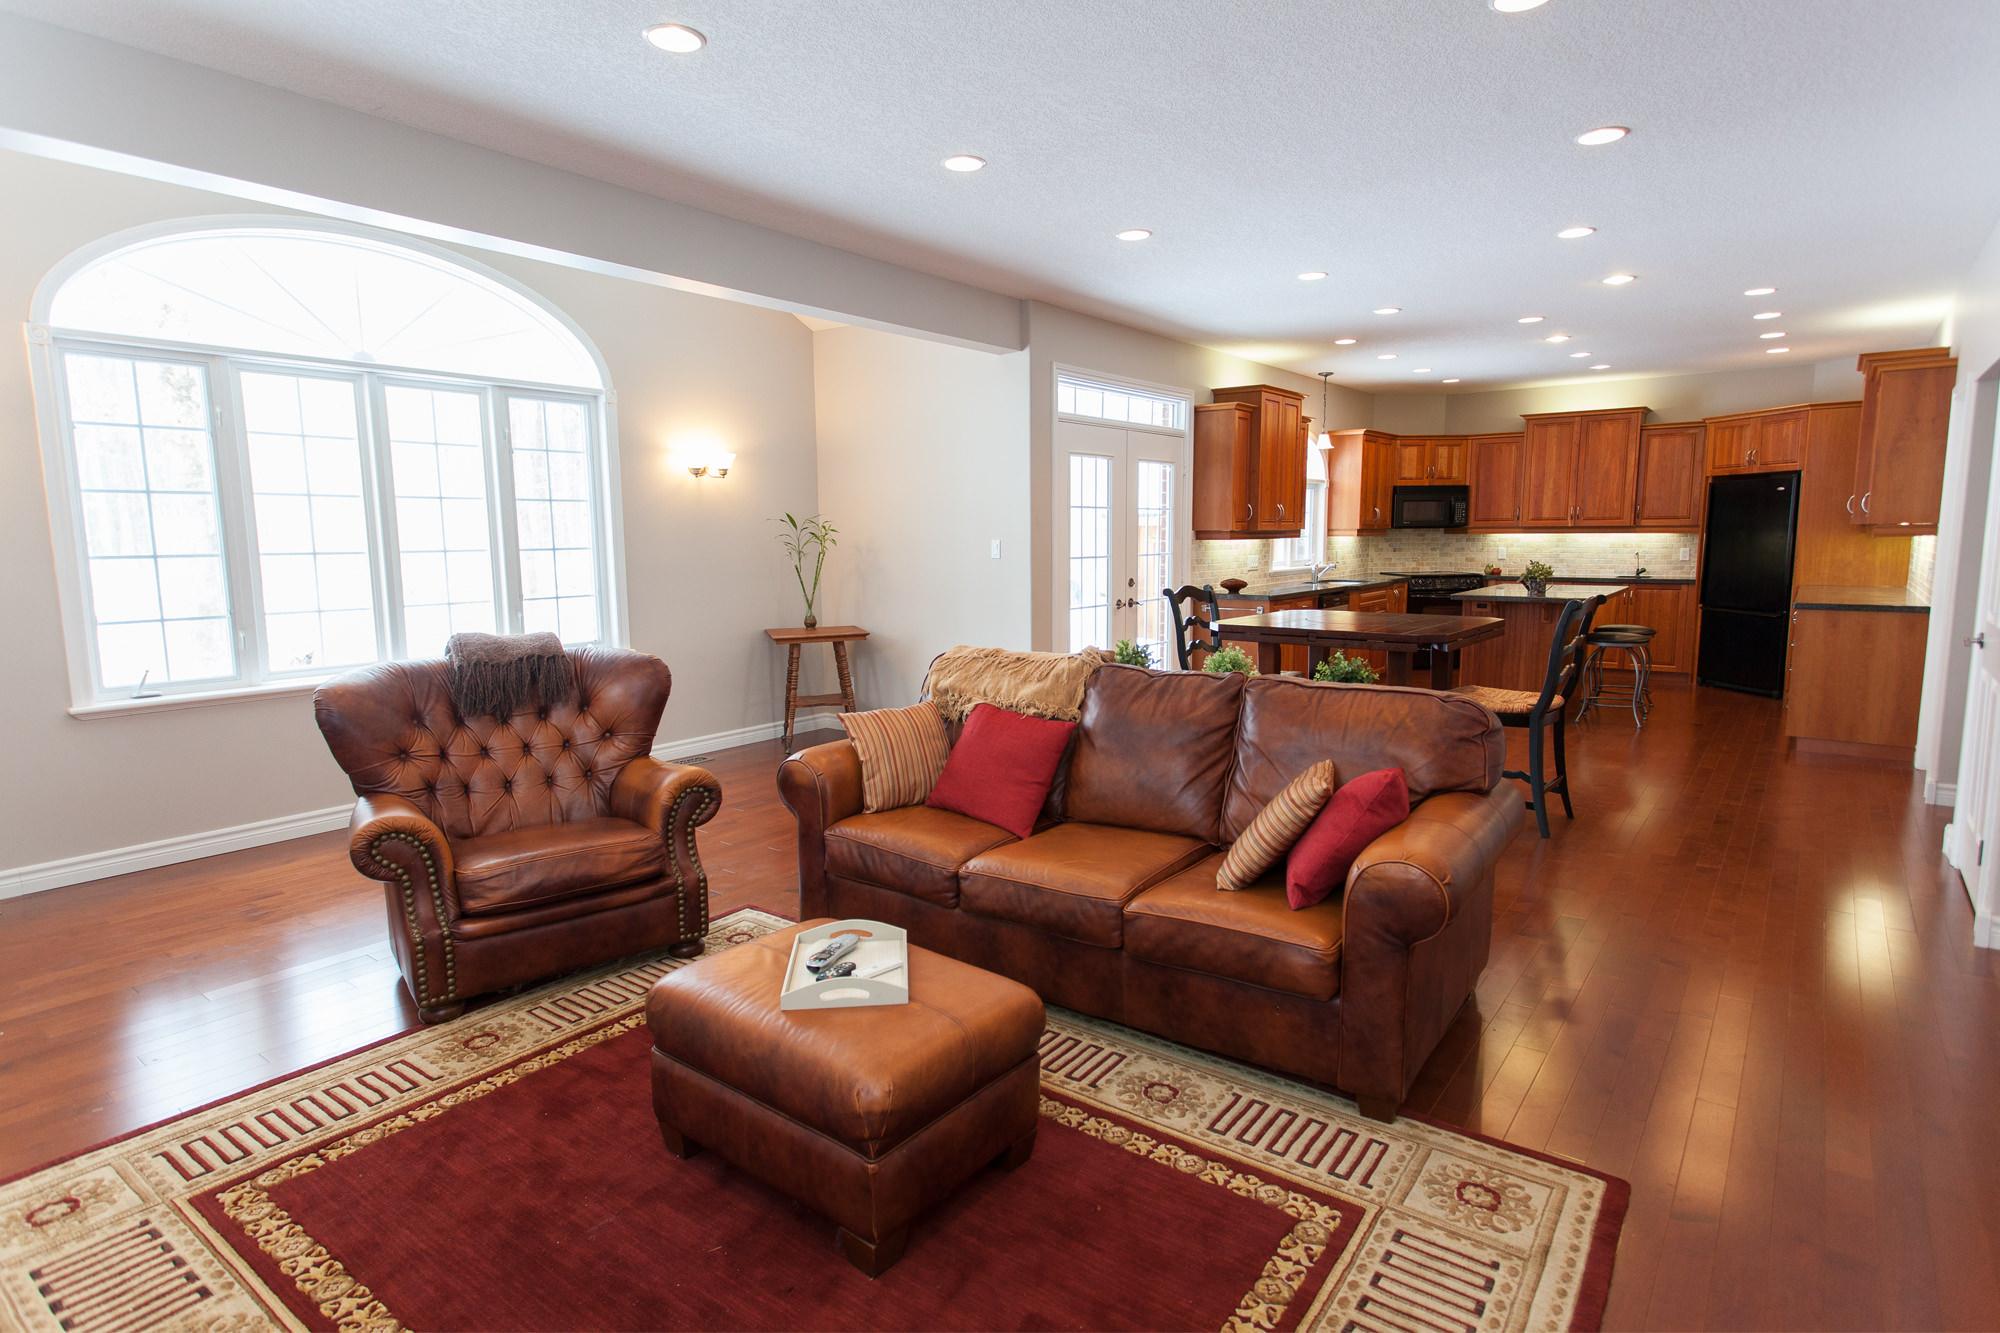 Beautiful, warm, oak hard wood floors in the kitchen